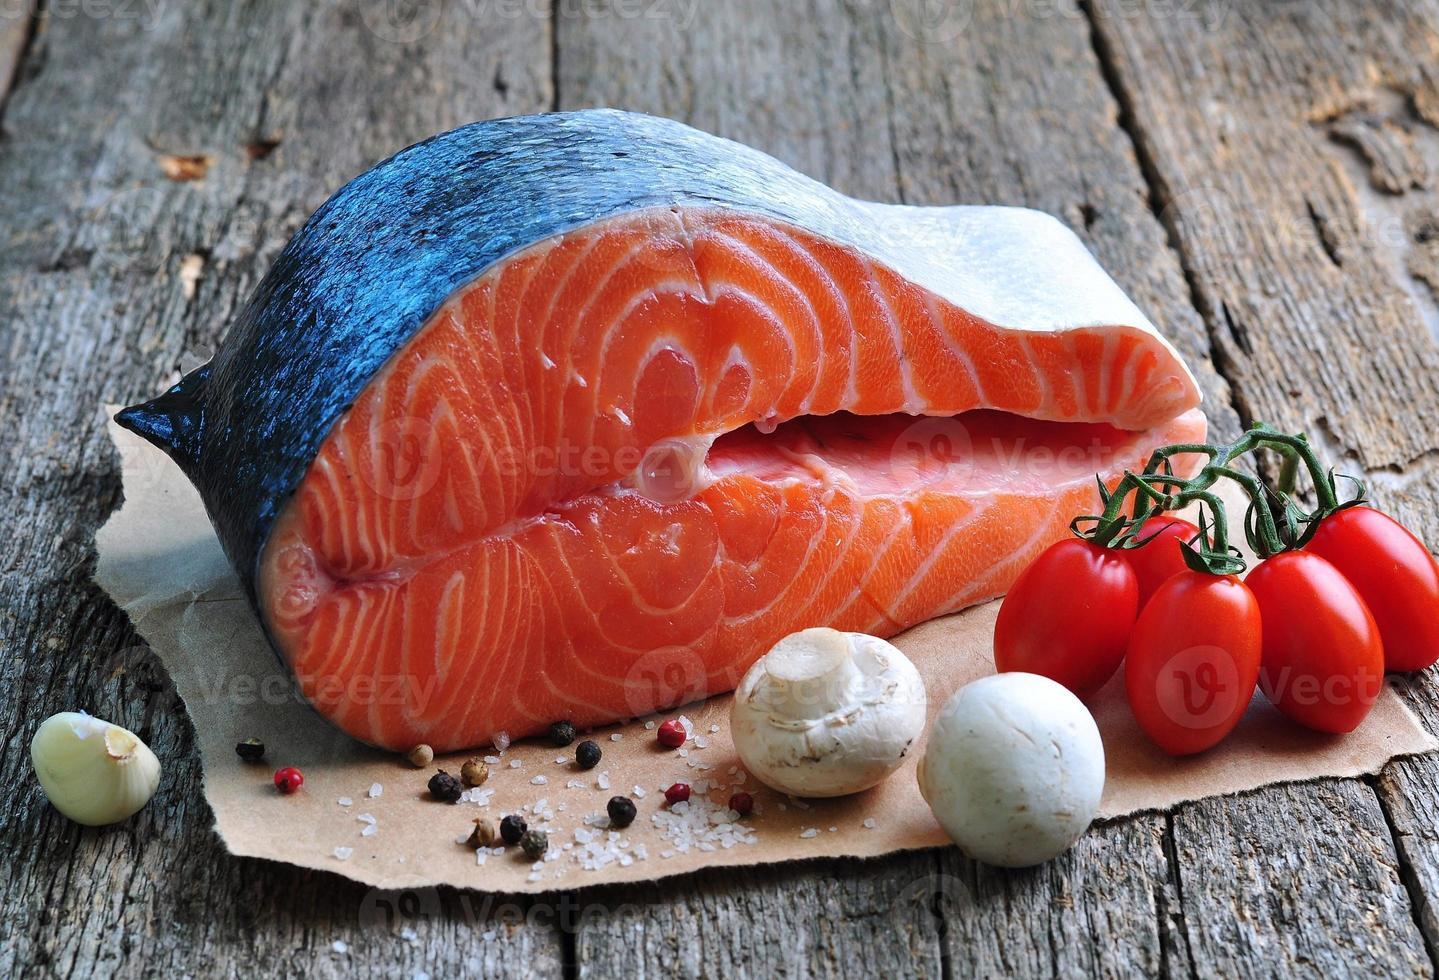 steak de saumon cru avec tomate cerise, champignon, oignons, aneth, ail photo